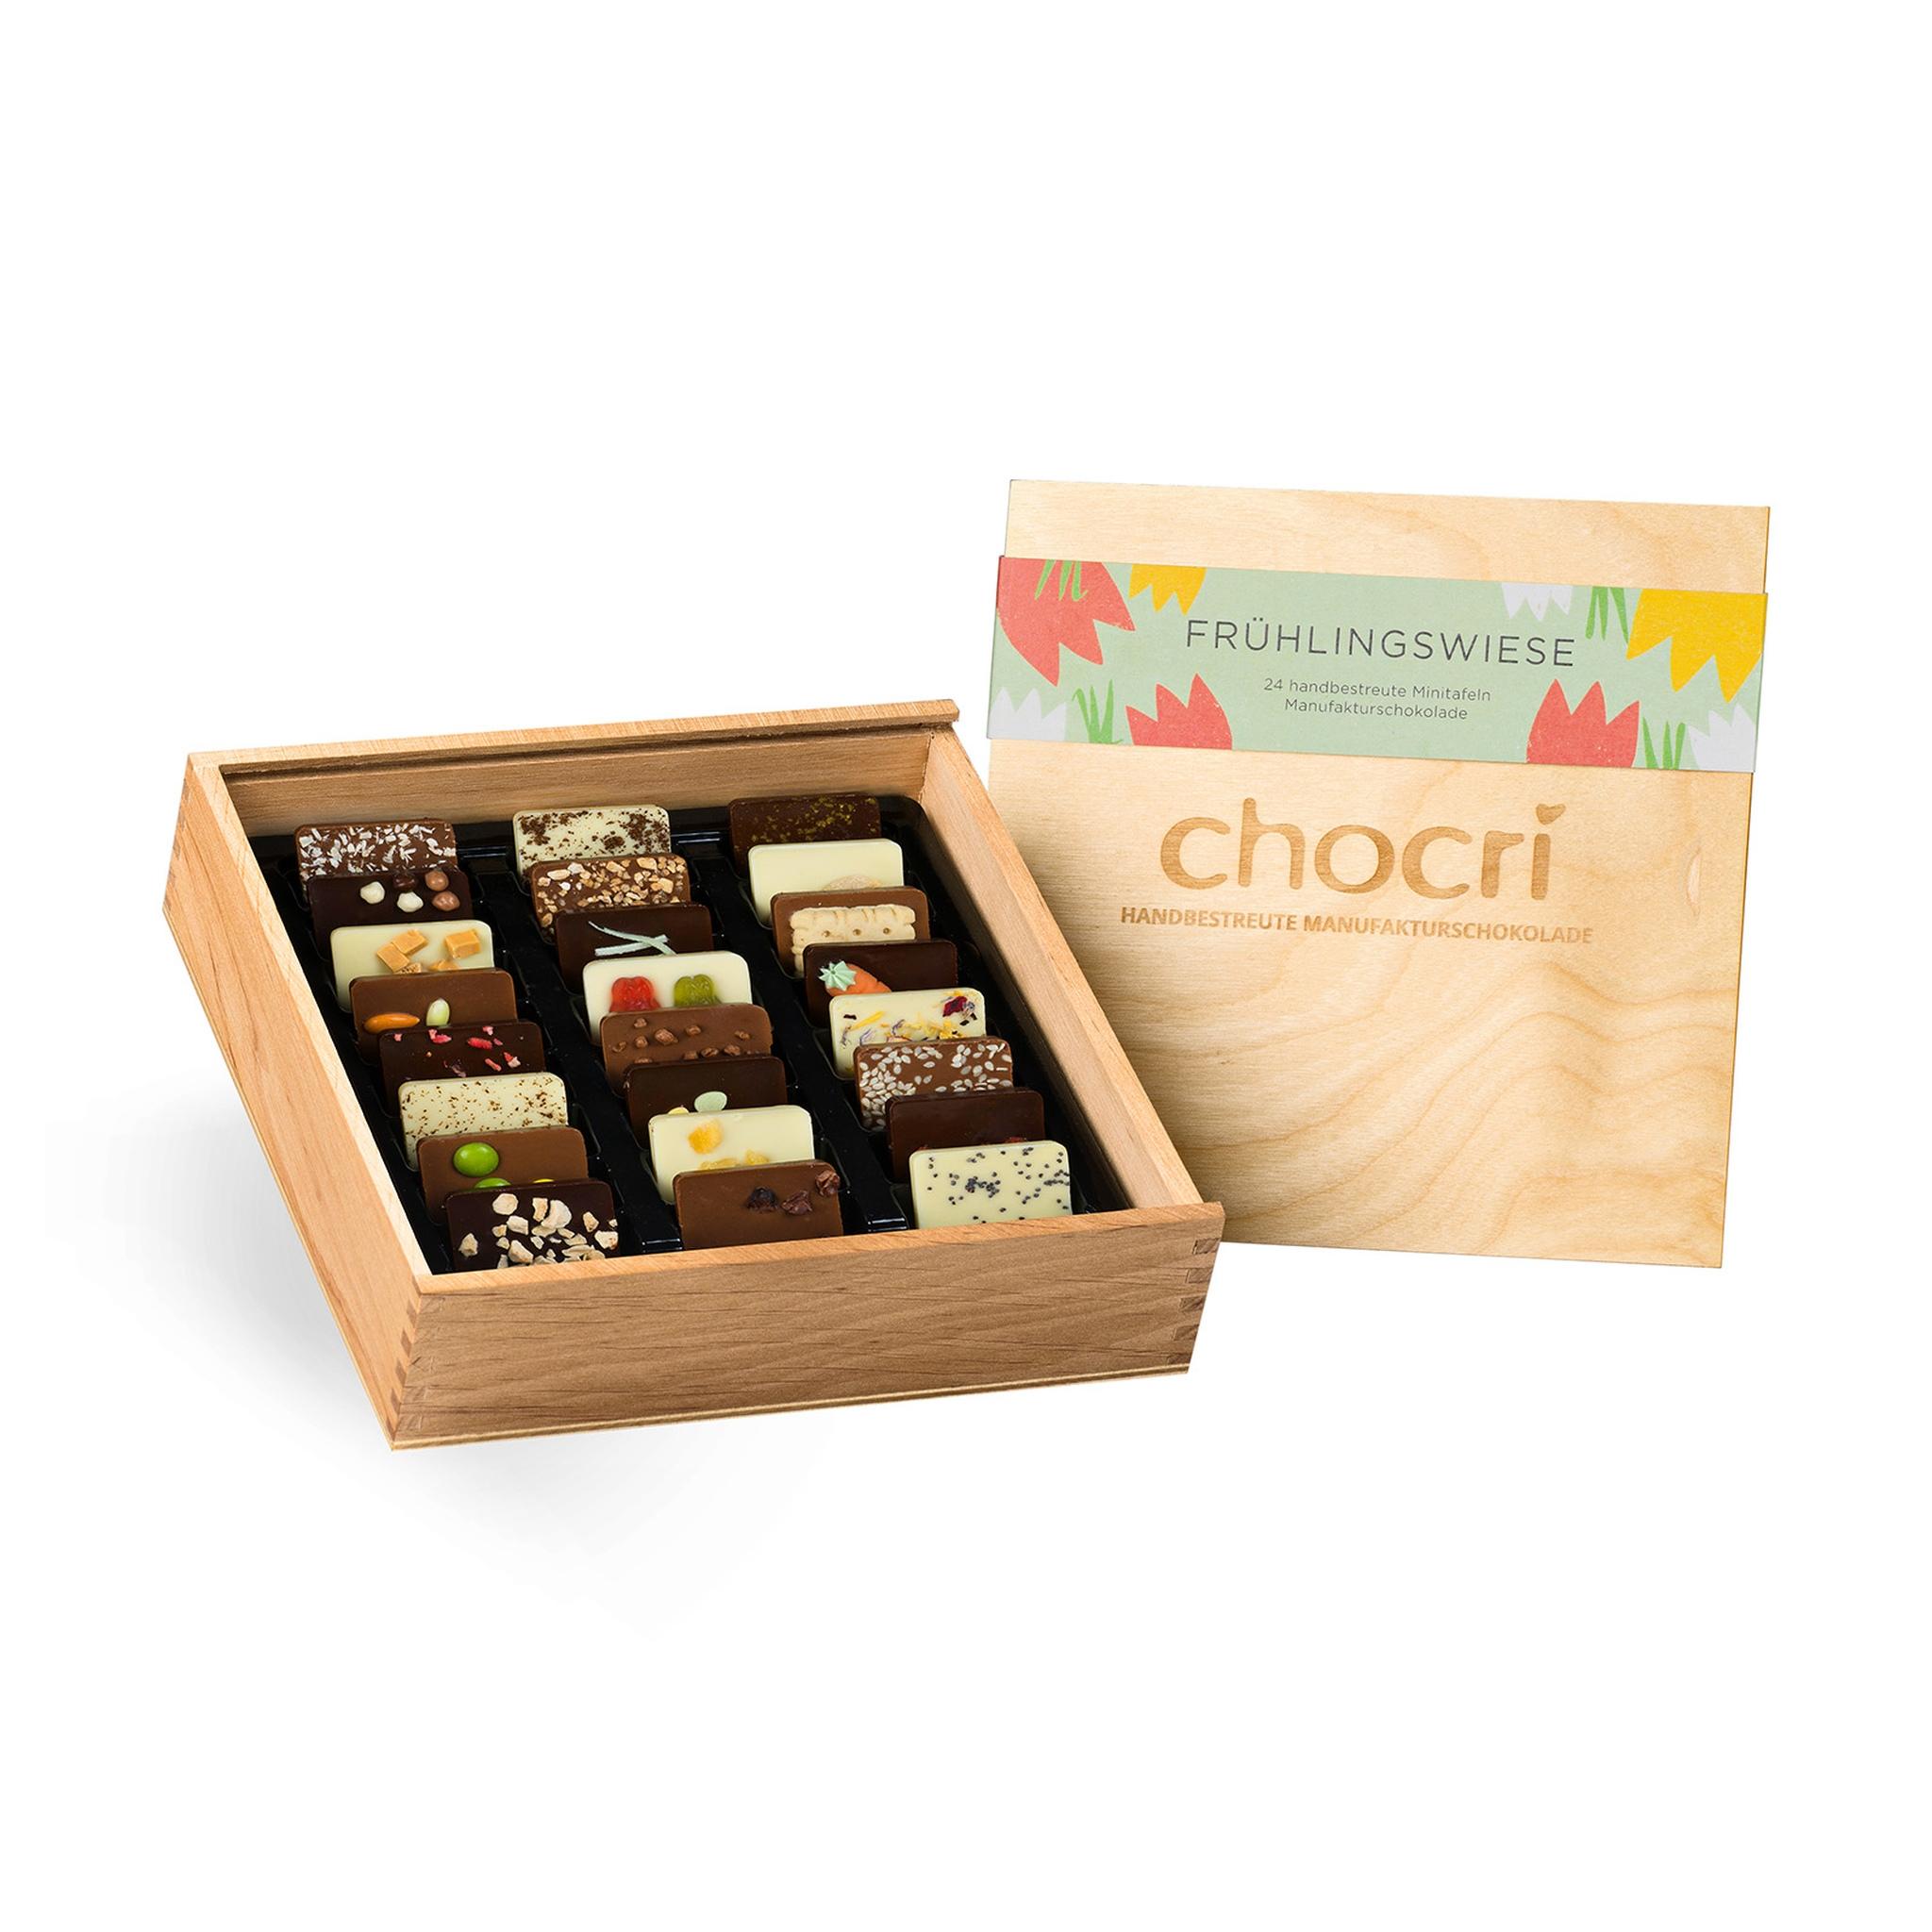 Köstlichsüsses - chocri 'Frühlingswiese' Mini Schokoladentafeln in Holz Box - Onlineshop Chocri